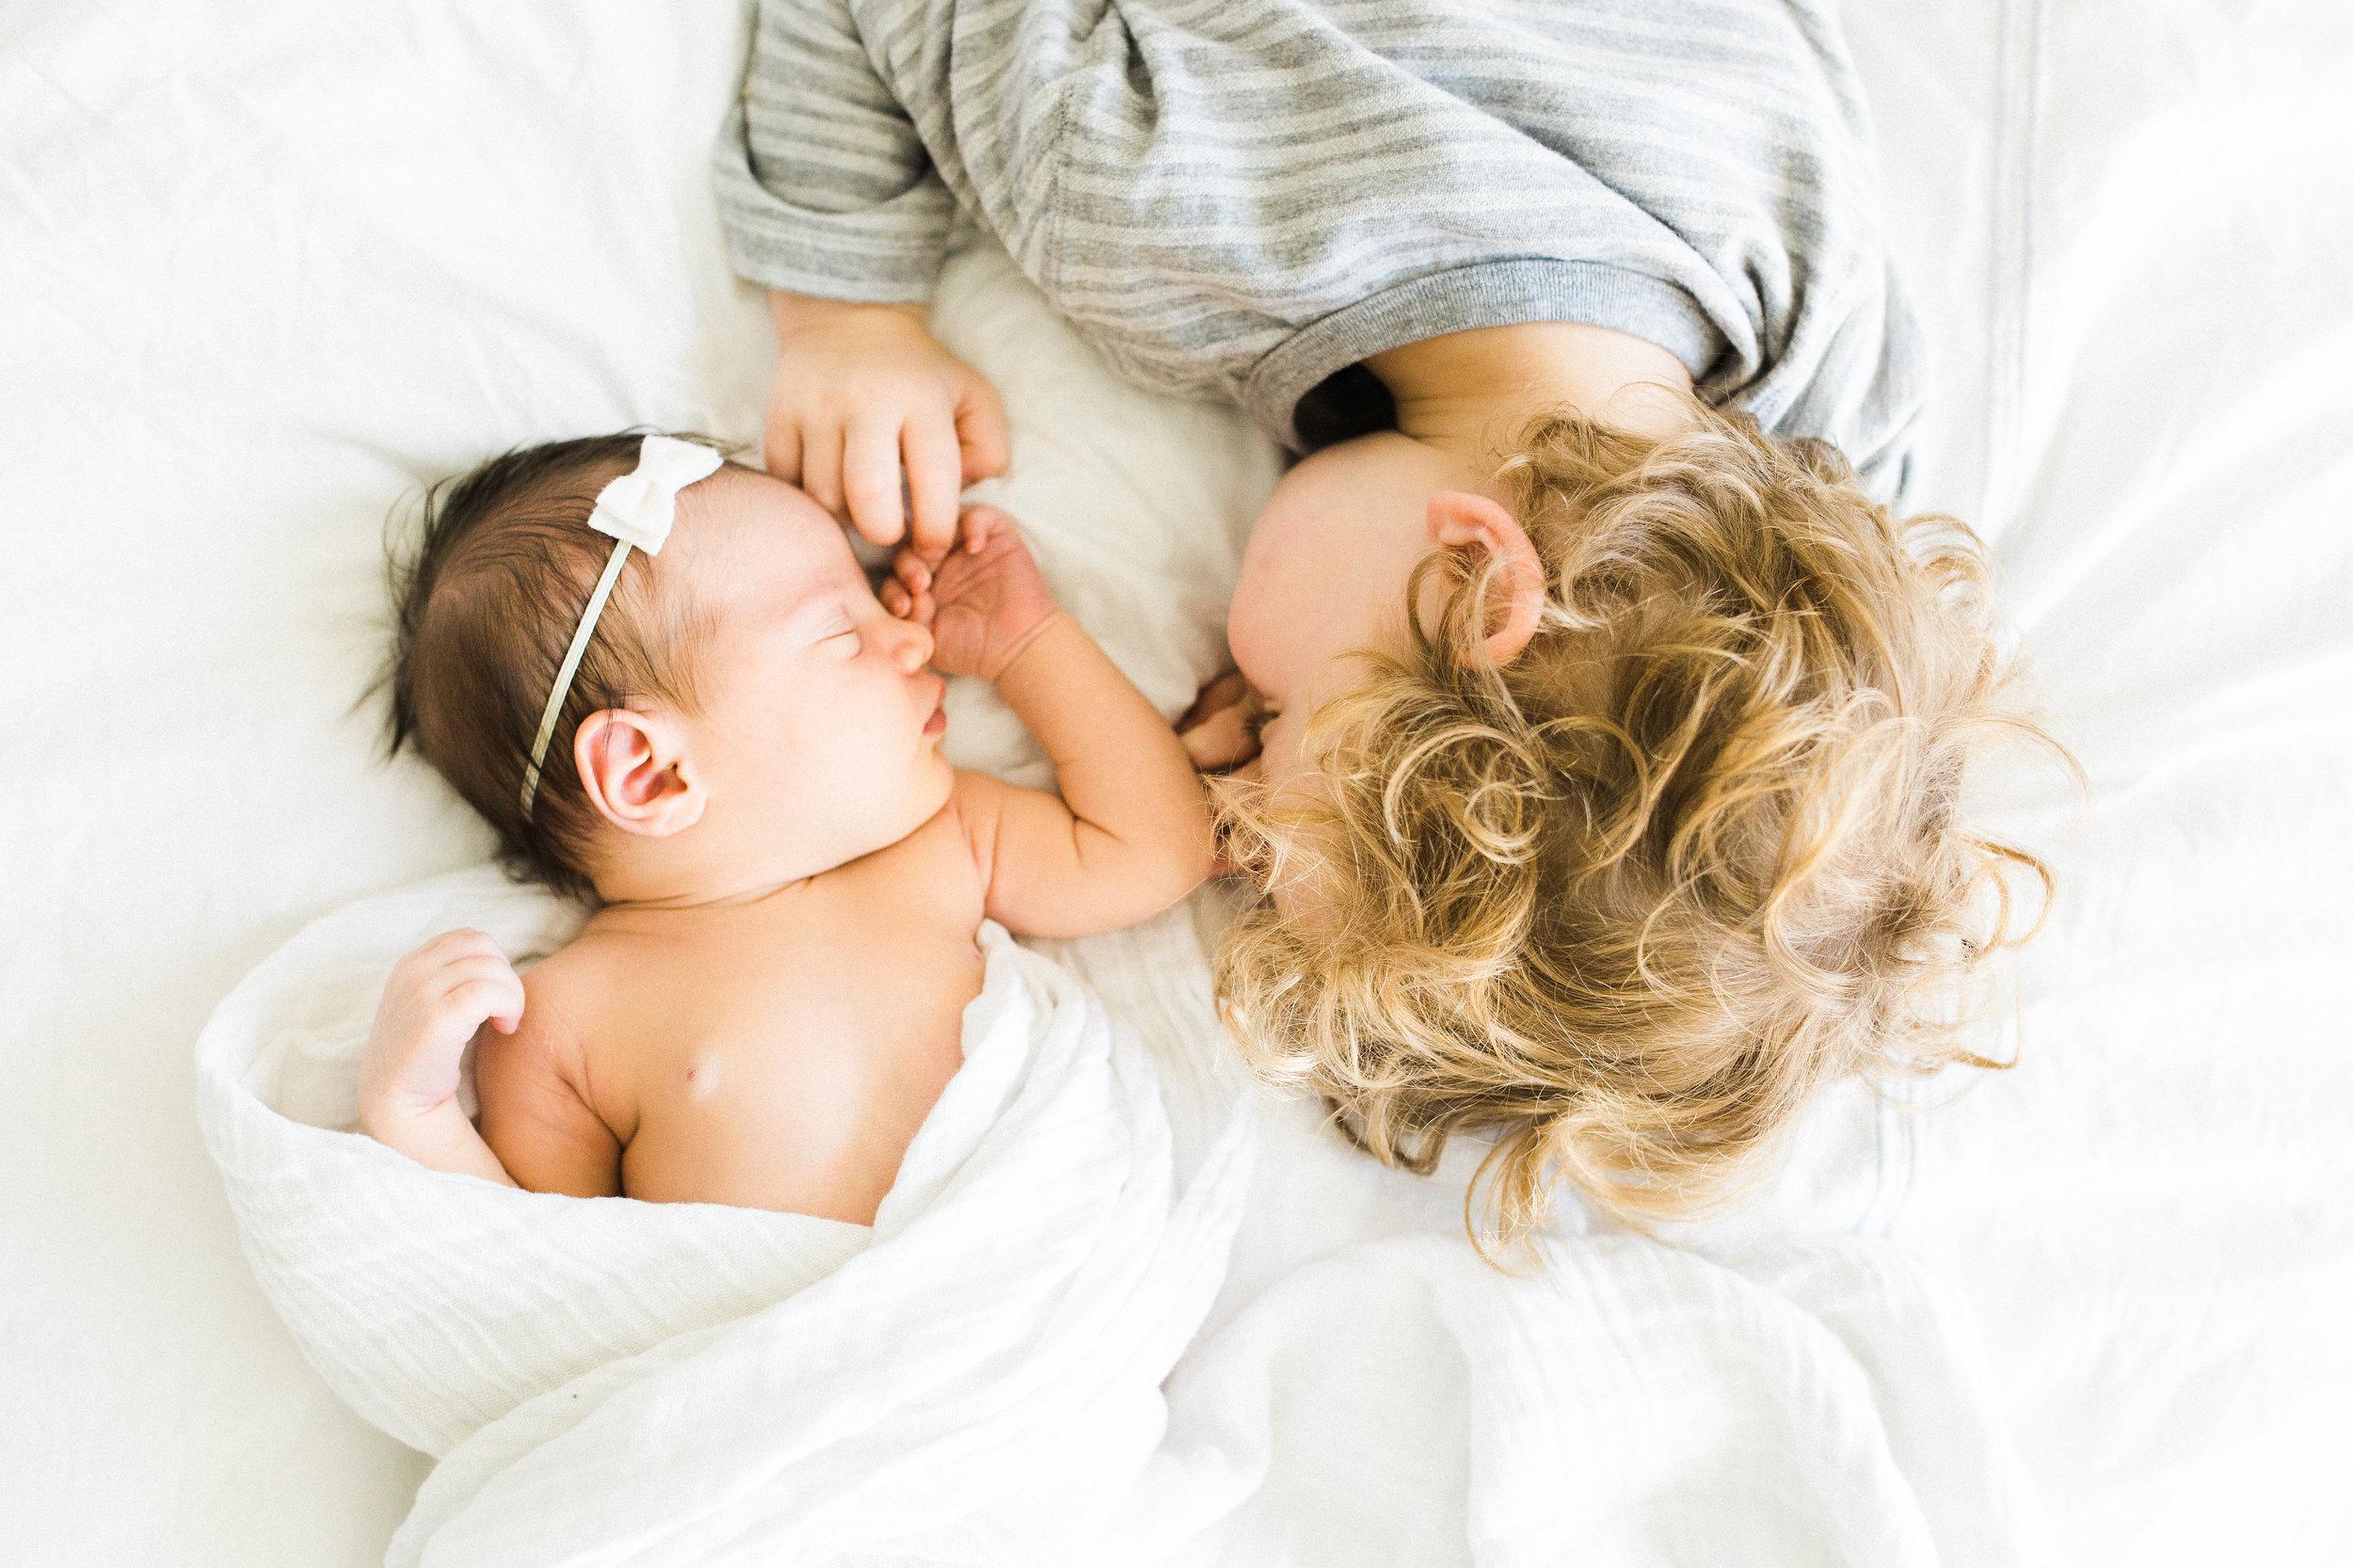 verbuch-family_brooklyn-ny-newborn-photography-64.jpg